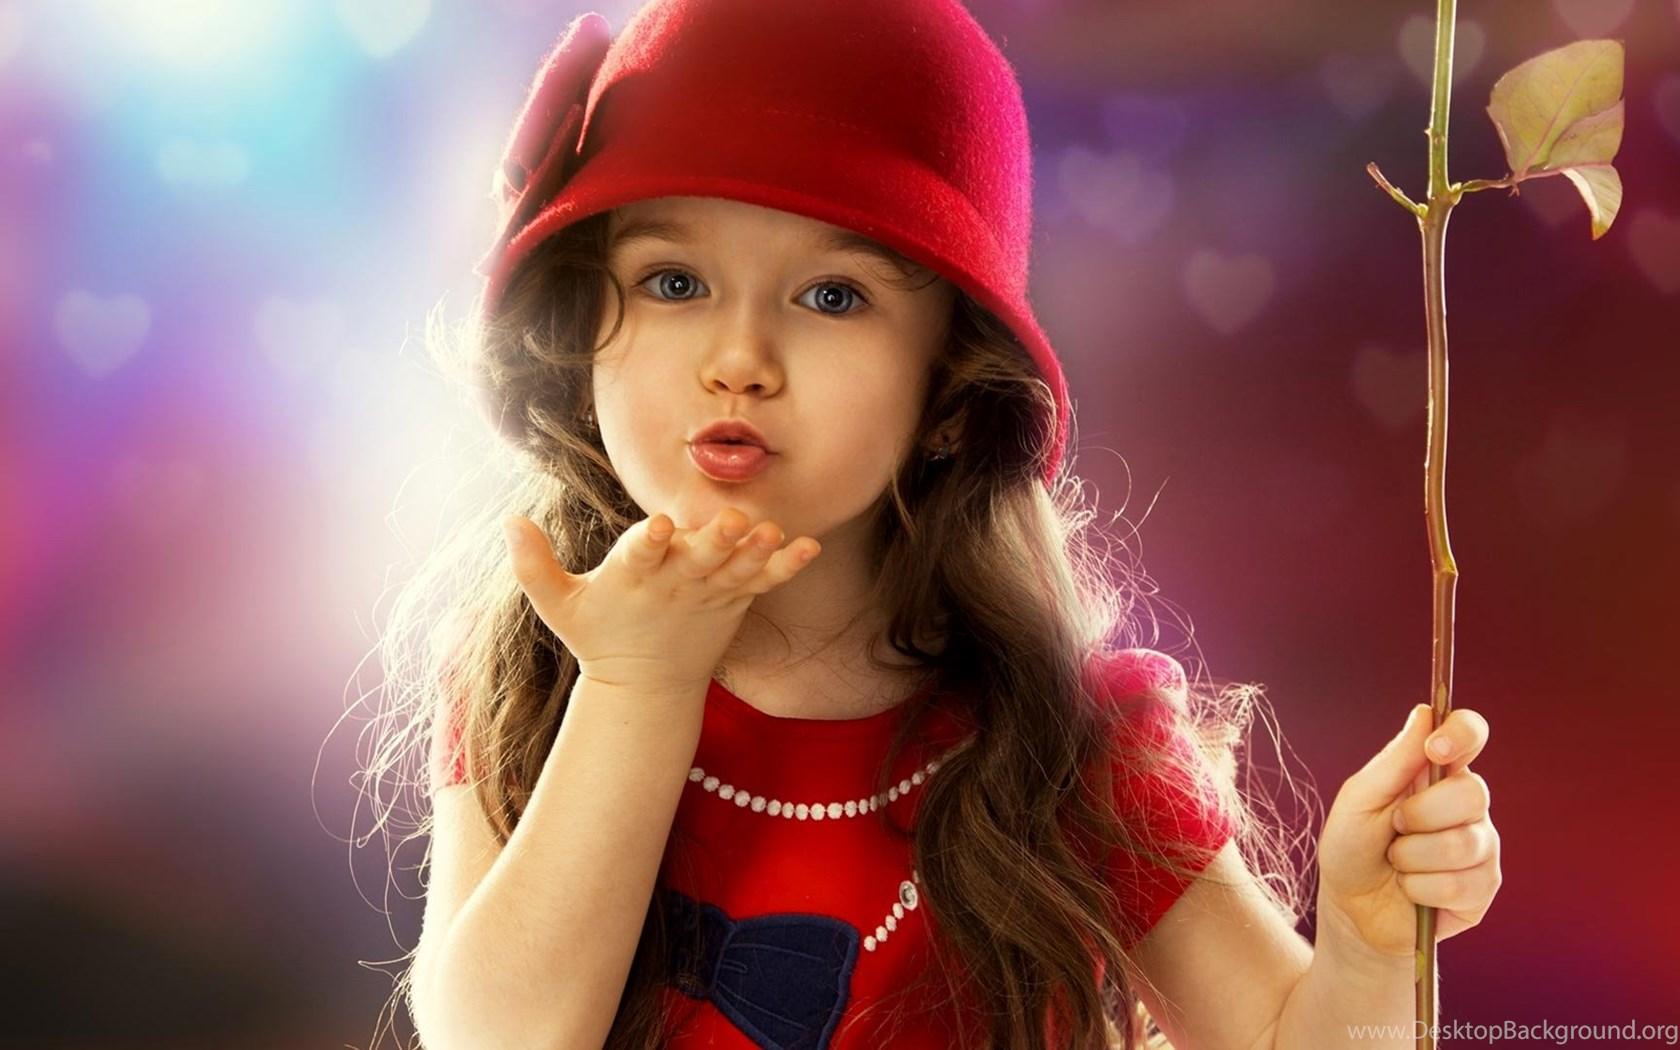 sweet baby girl wallpapers hd for desktop hdwallpicx desktop